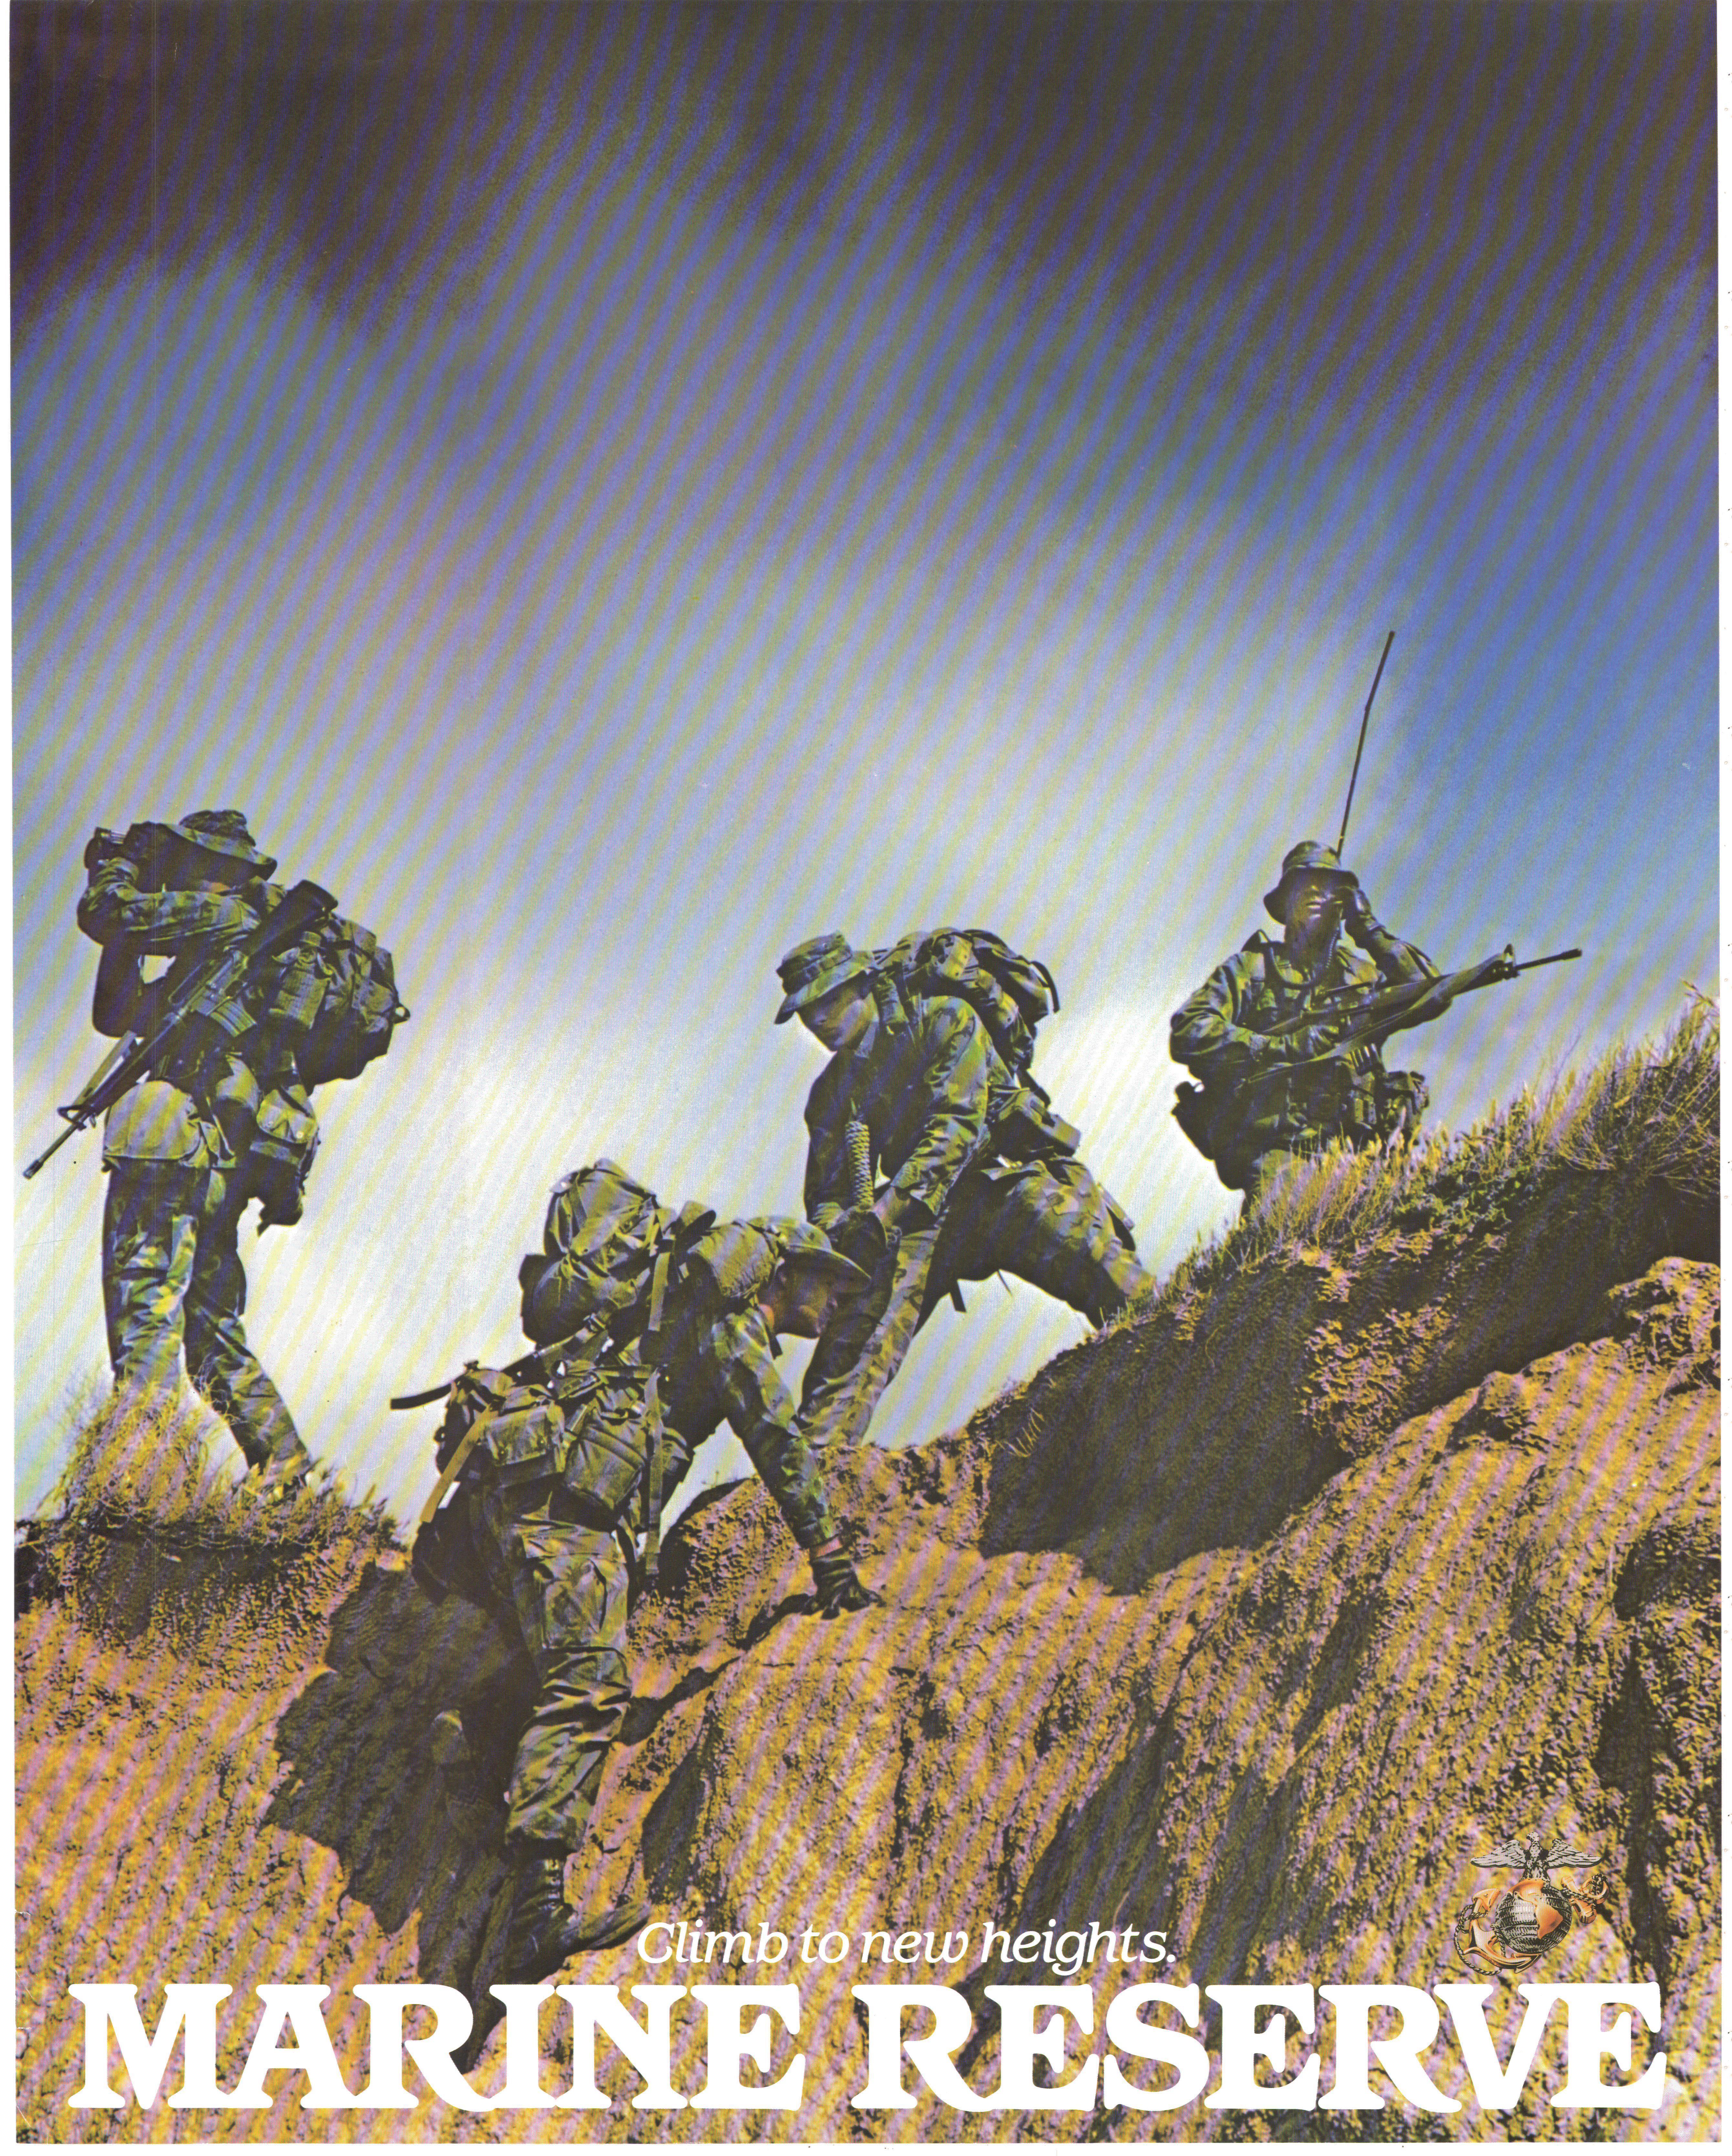 U.S. Marine Corps Forces Reserve